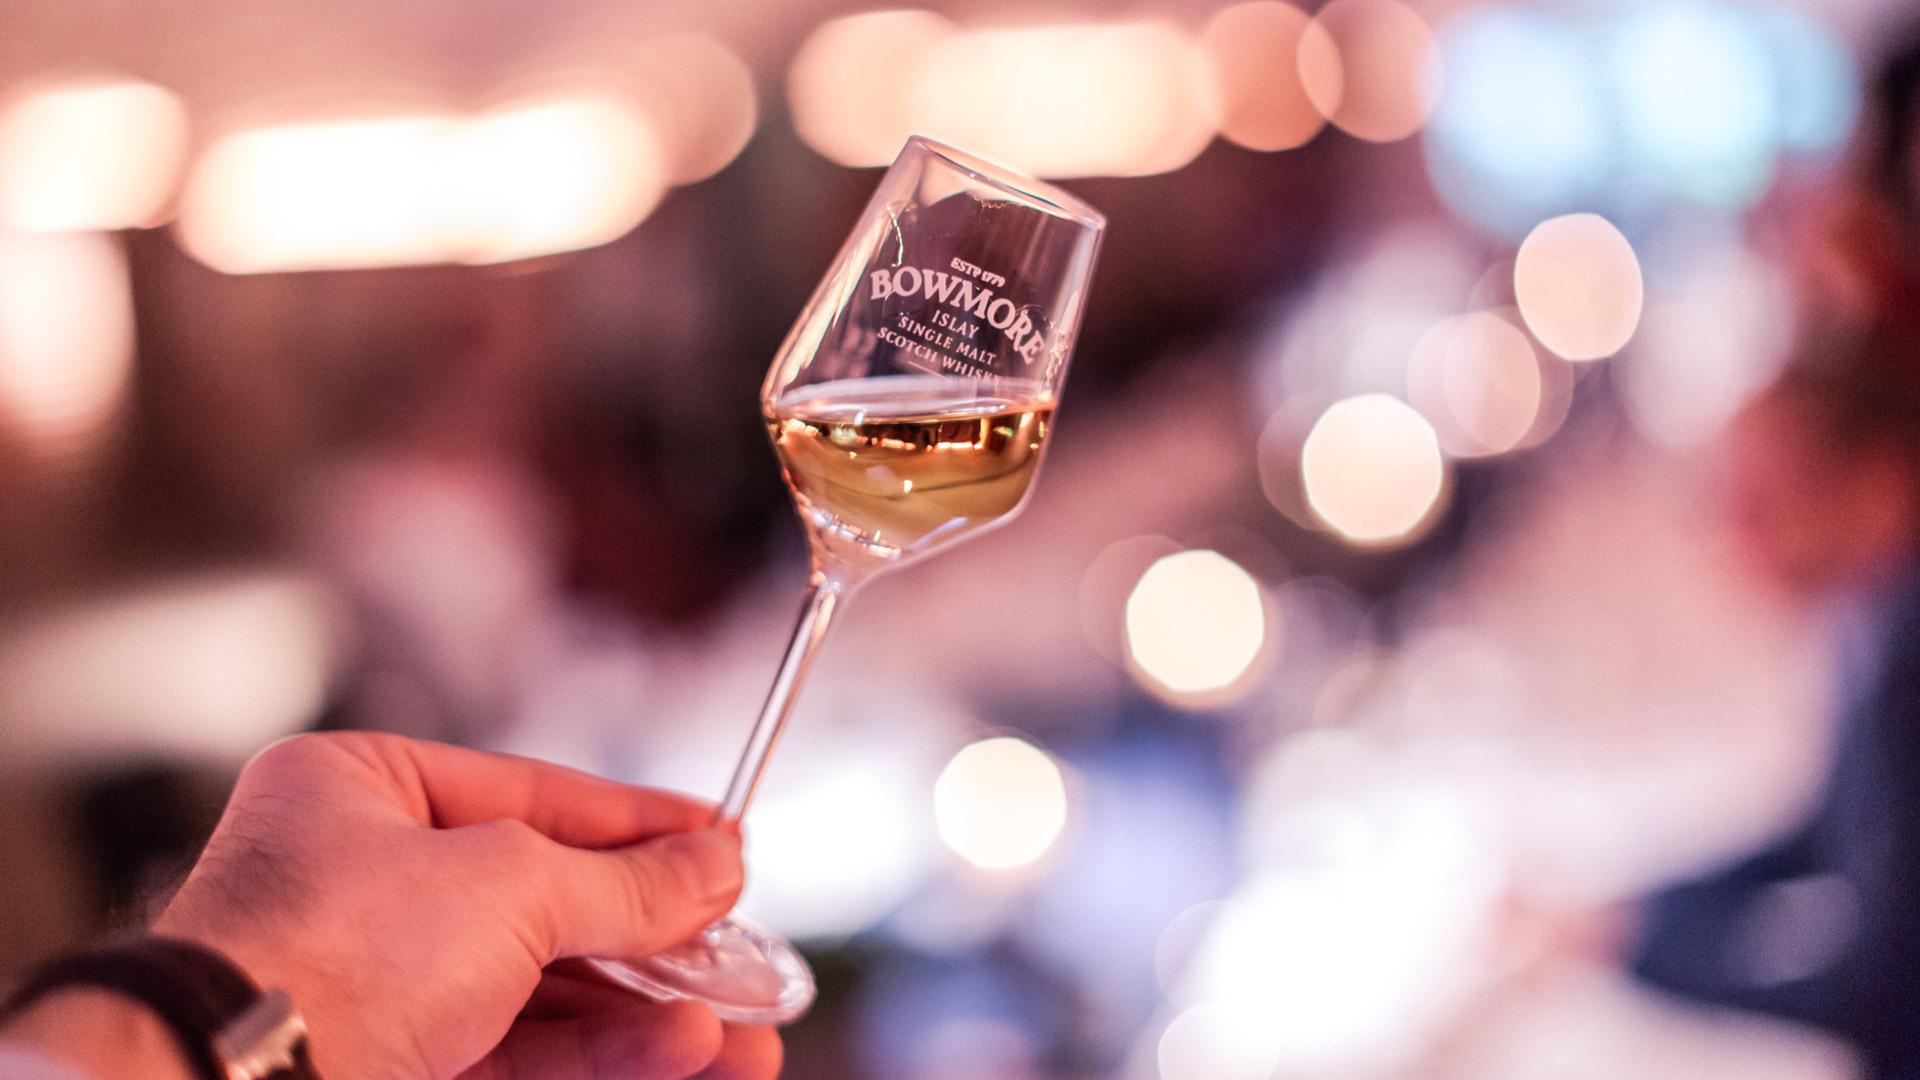 Hell schimmert der Bowmore-Whiskys im Glas. (Foto © www.offenblen.de)